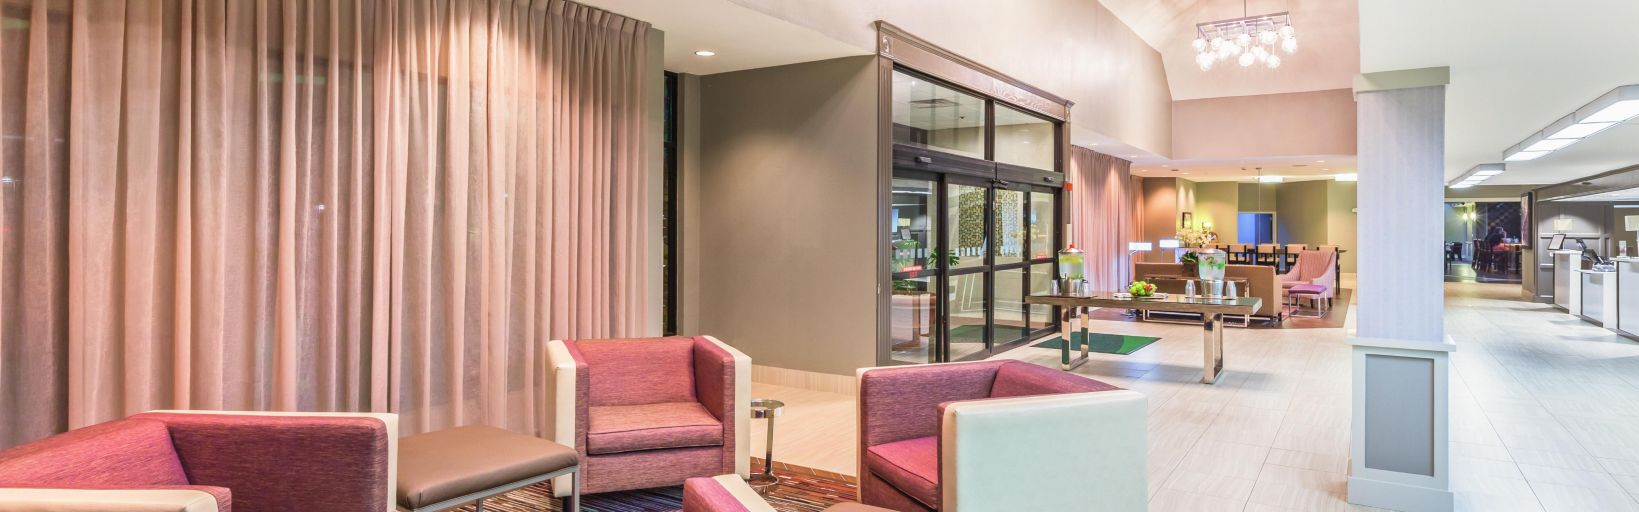 Holiday Inn Tyler-South Broadway Hotel IHG